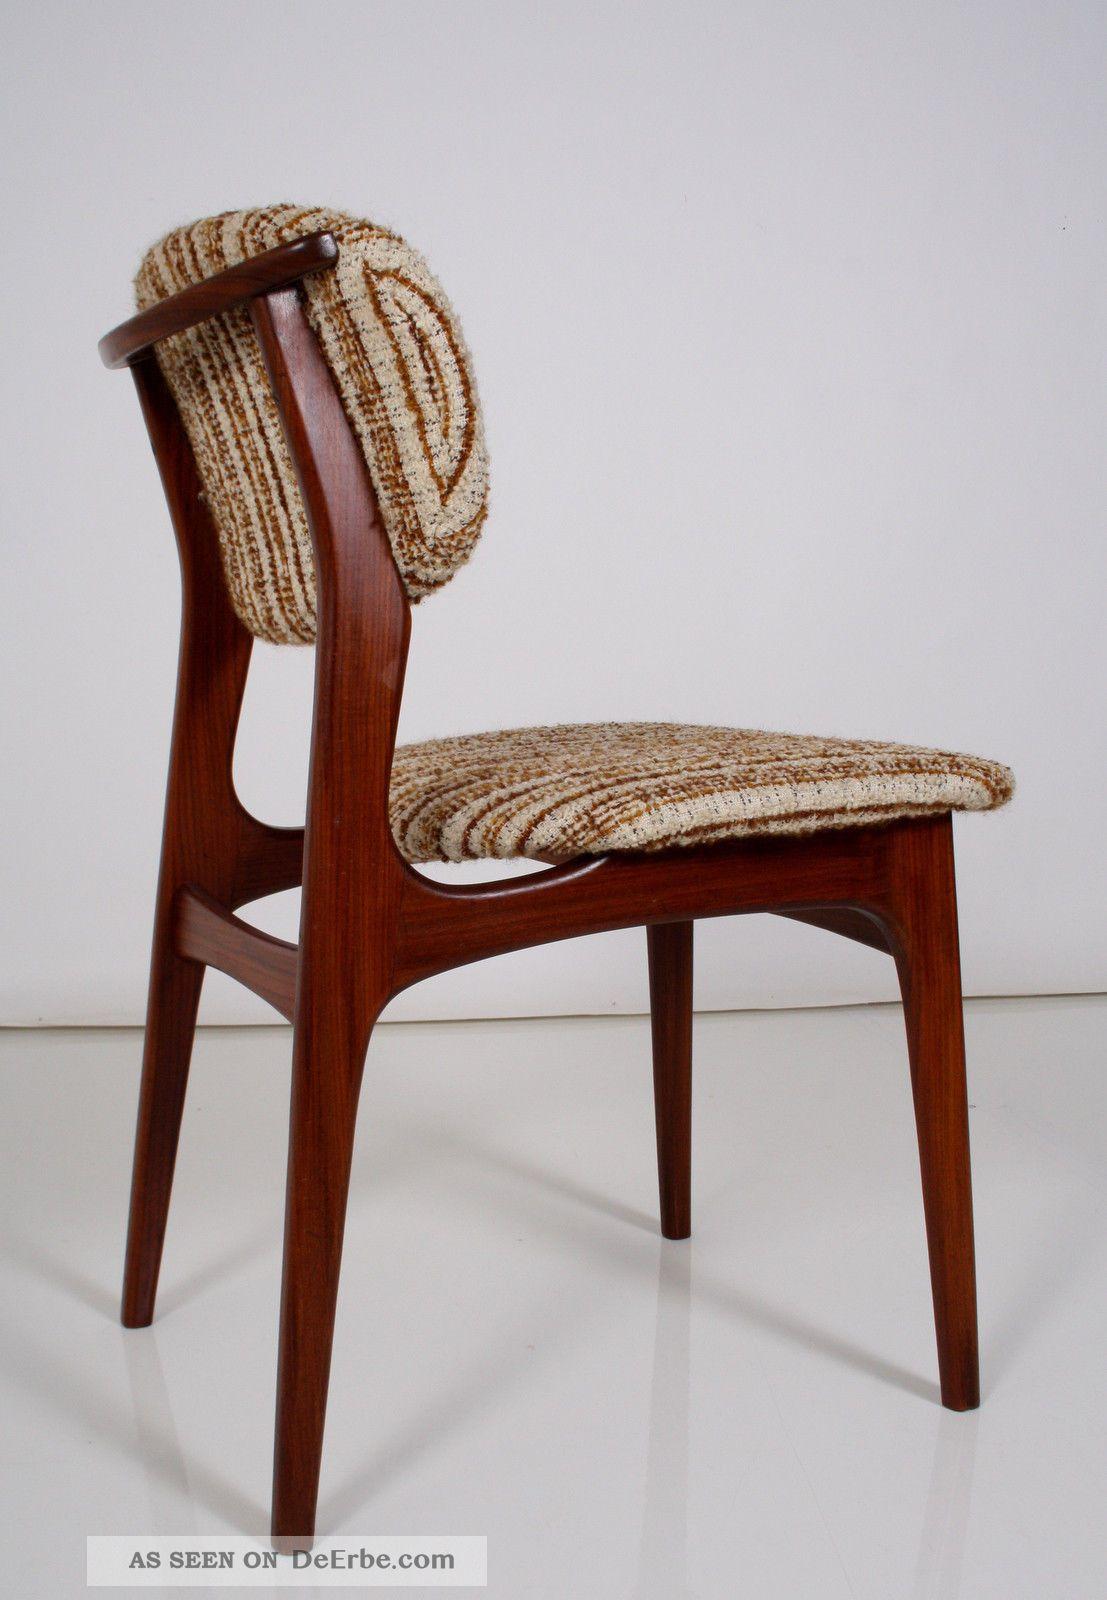 60er stuhl teak vintage chair 60s skandinavisches design for Stuhl skandinavisches design